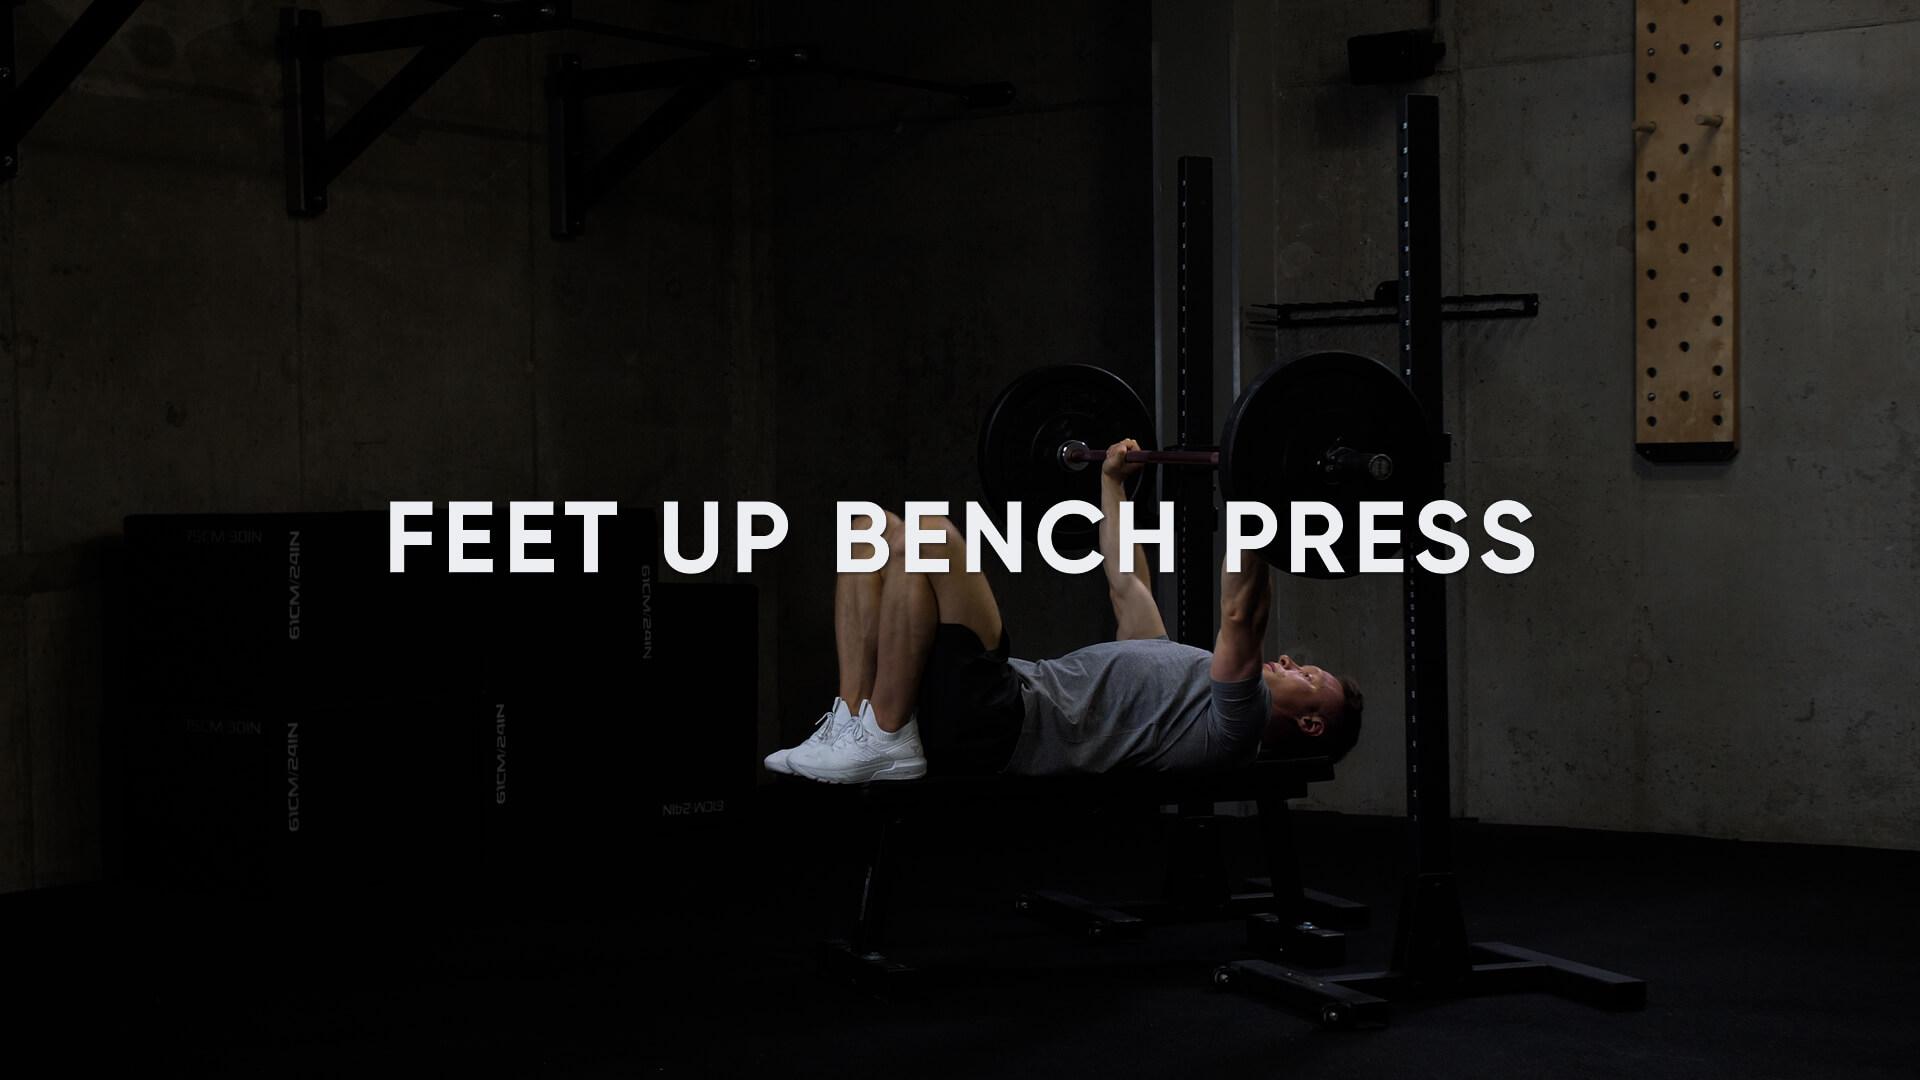 Feet Up Bench Press